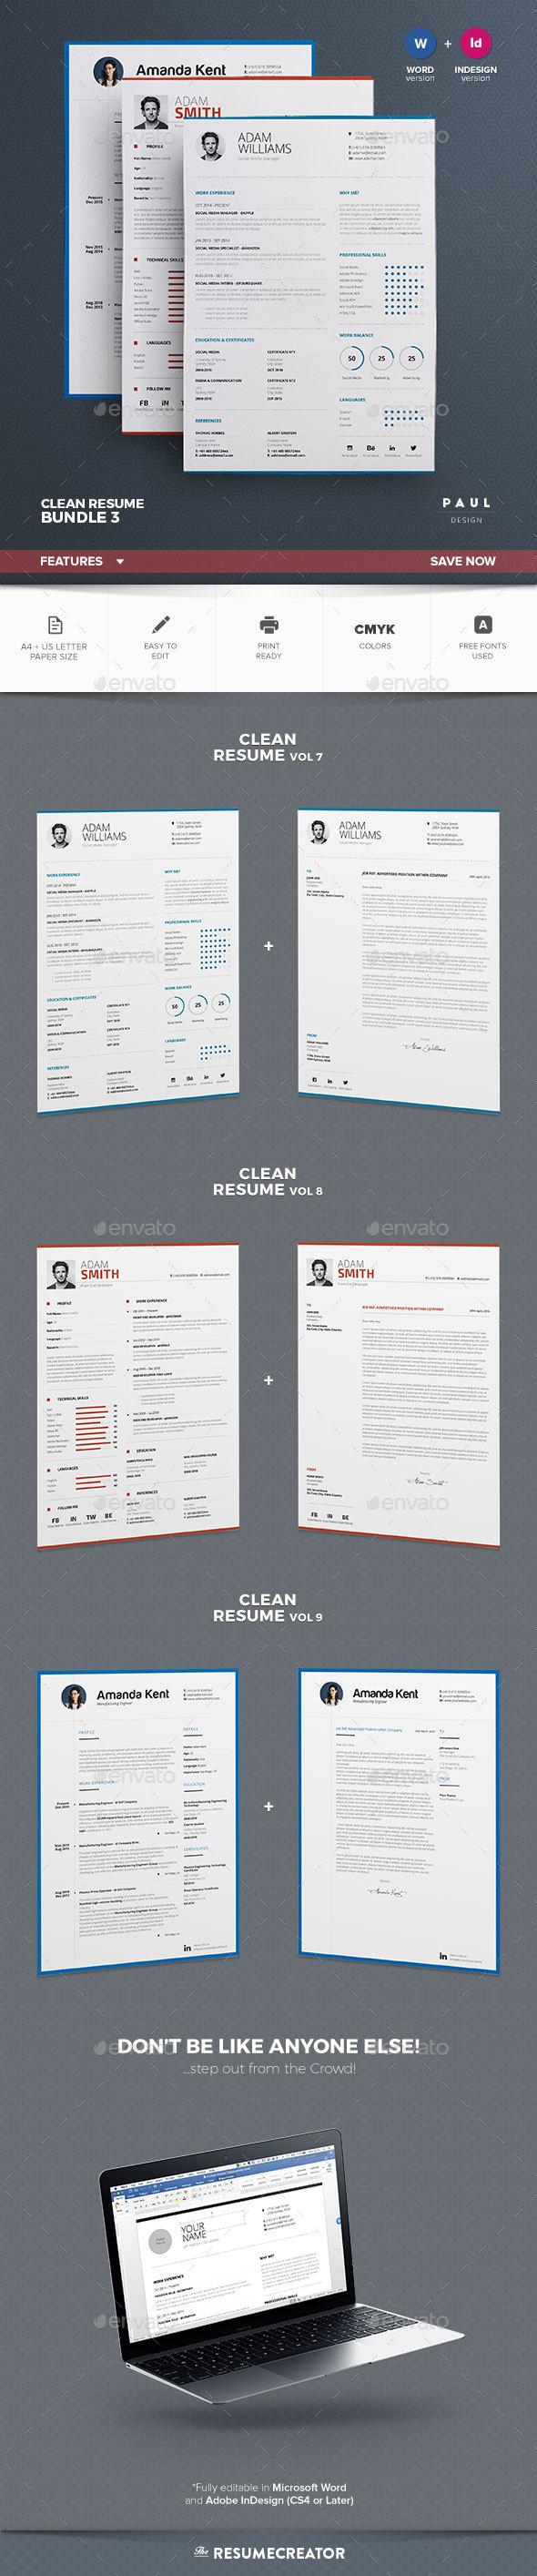 Clean resumecv bundle vol3 resume cv and cleaning clean resume cv bundle template indesign indd ms word download here https yelopaper Choice Image